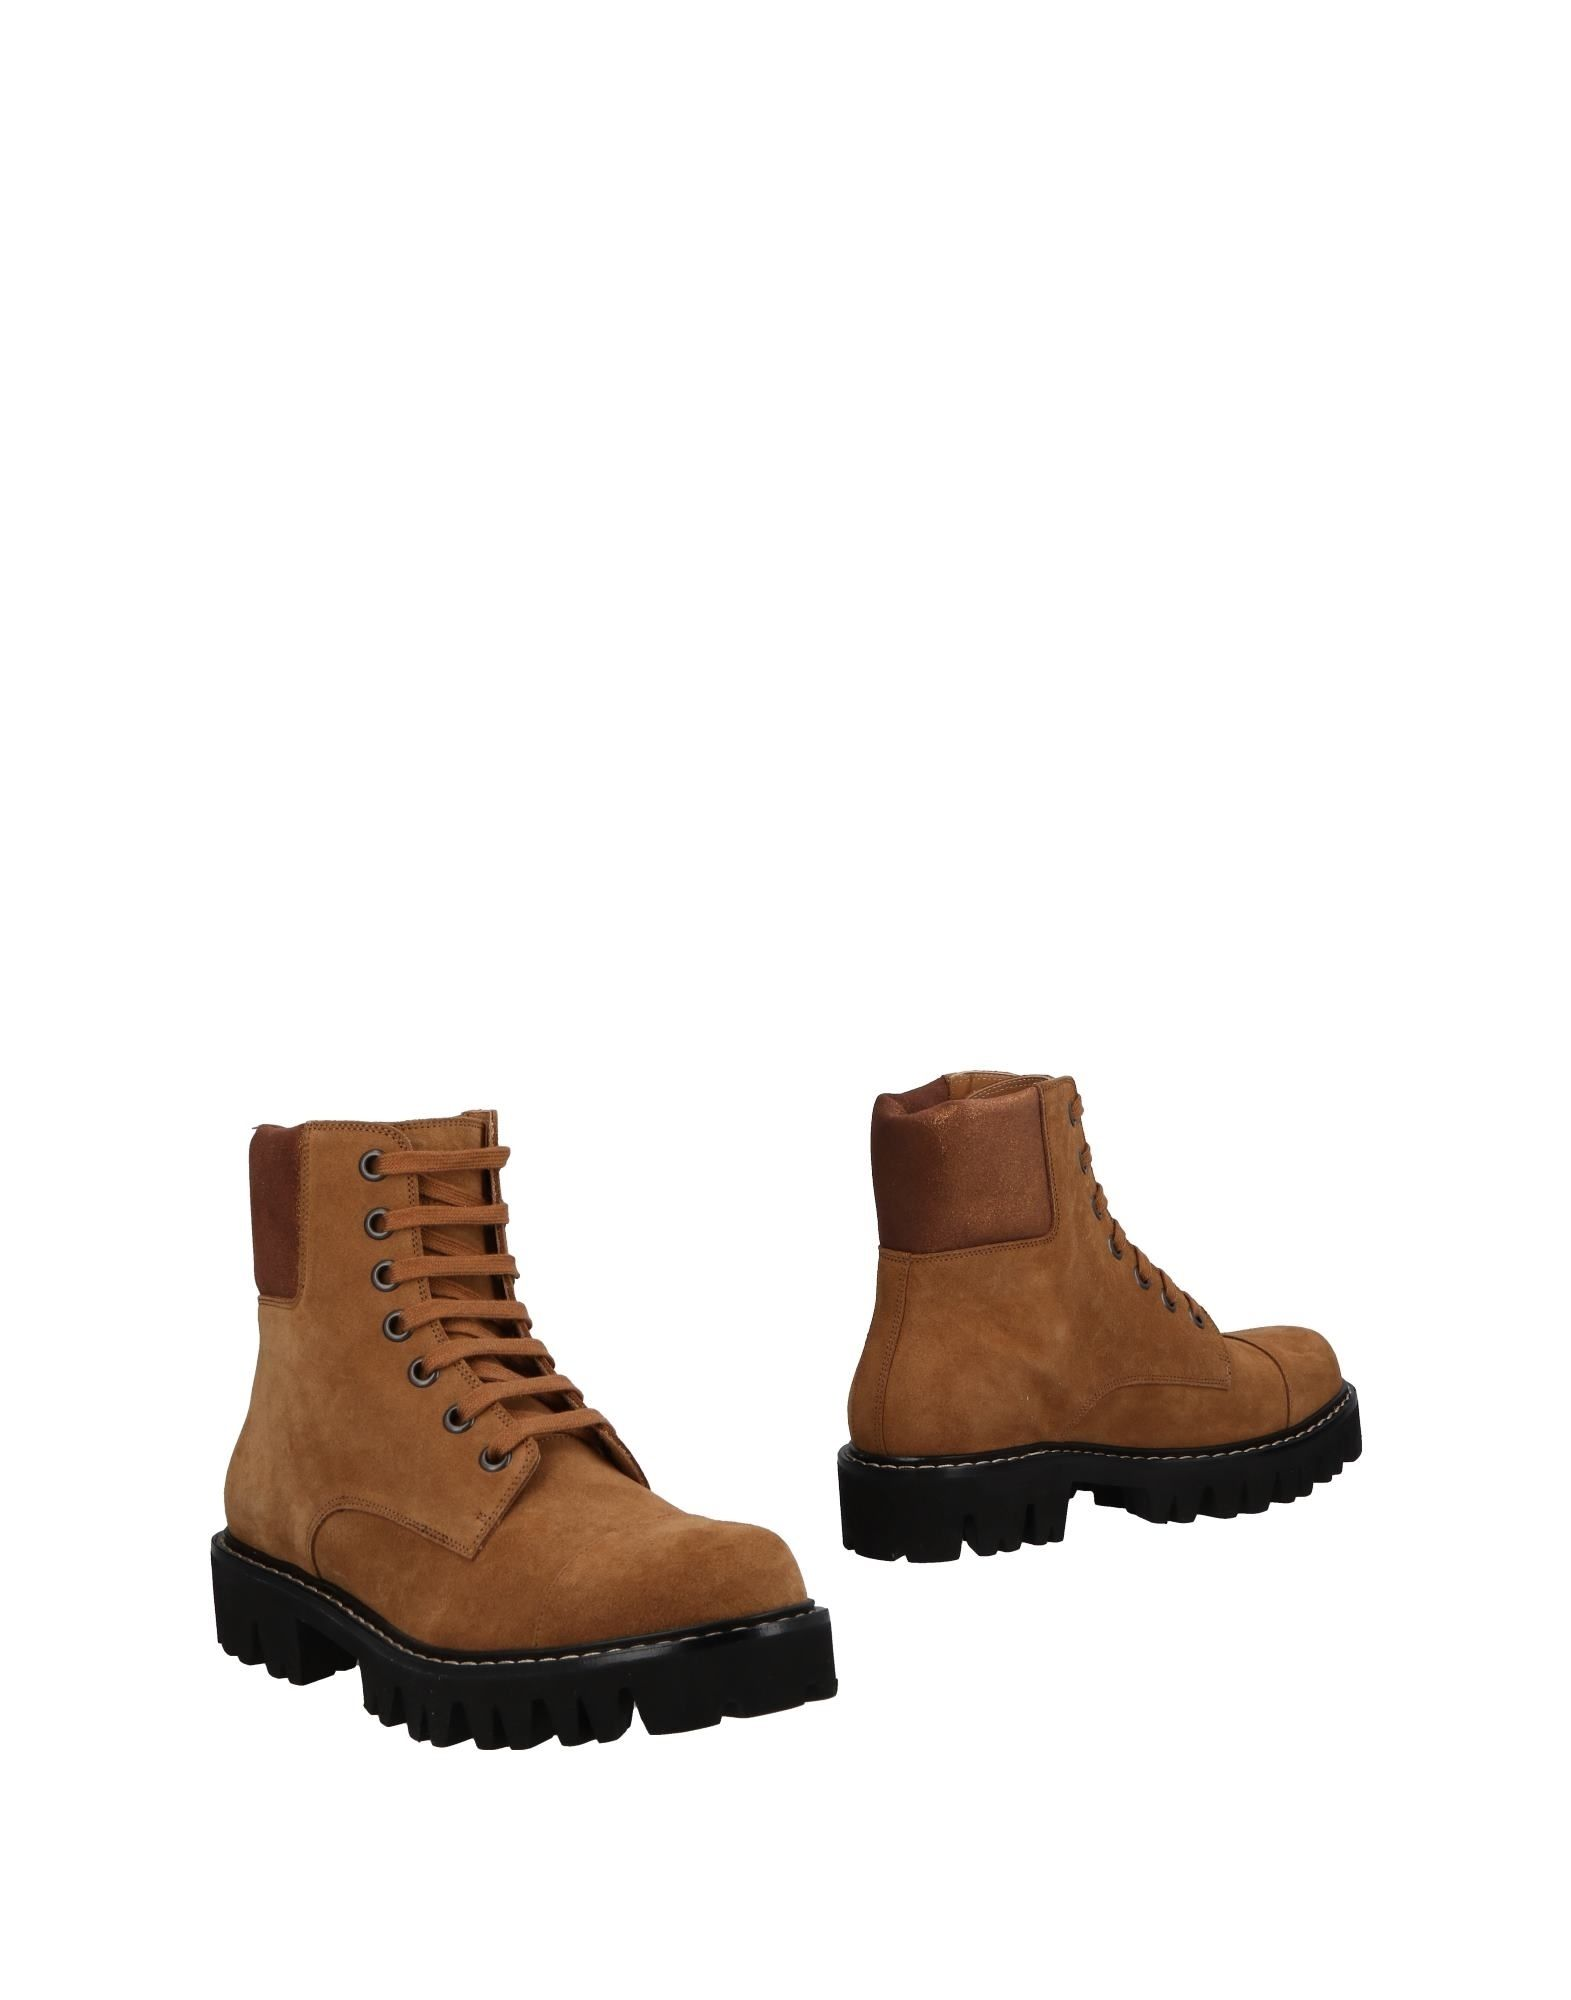 Rabatt Schuhe Marc Jacobs Stiefelette Damen  11480966WQ